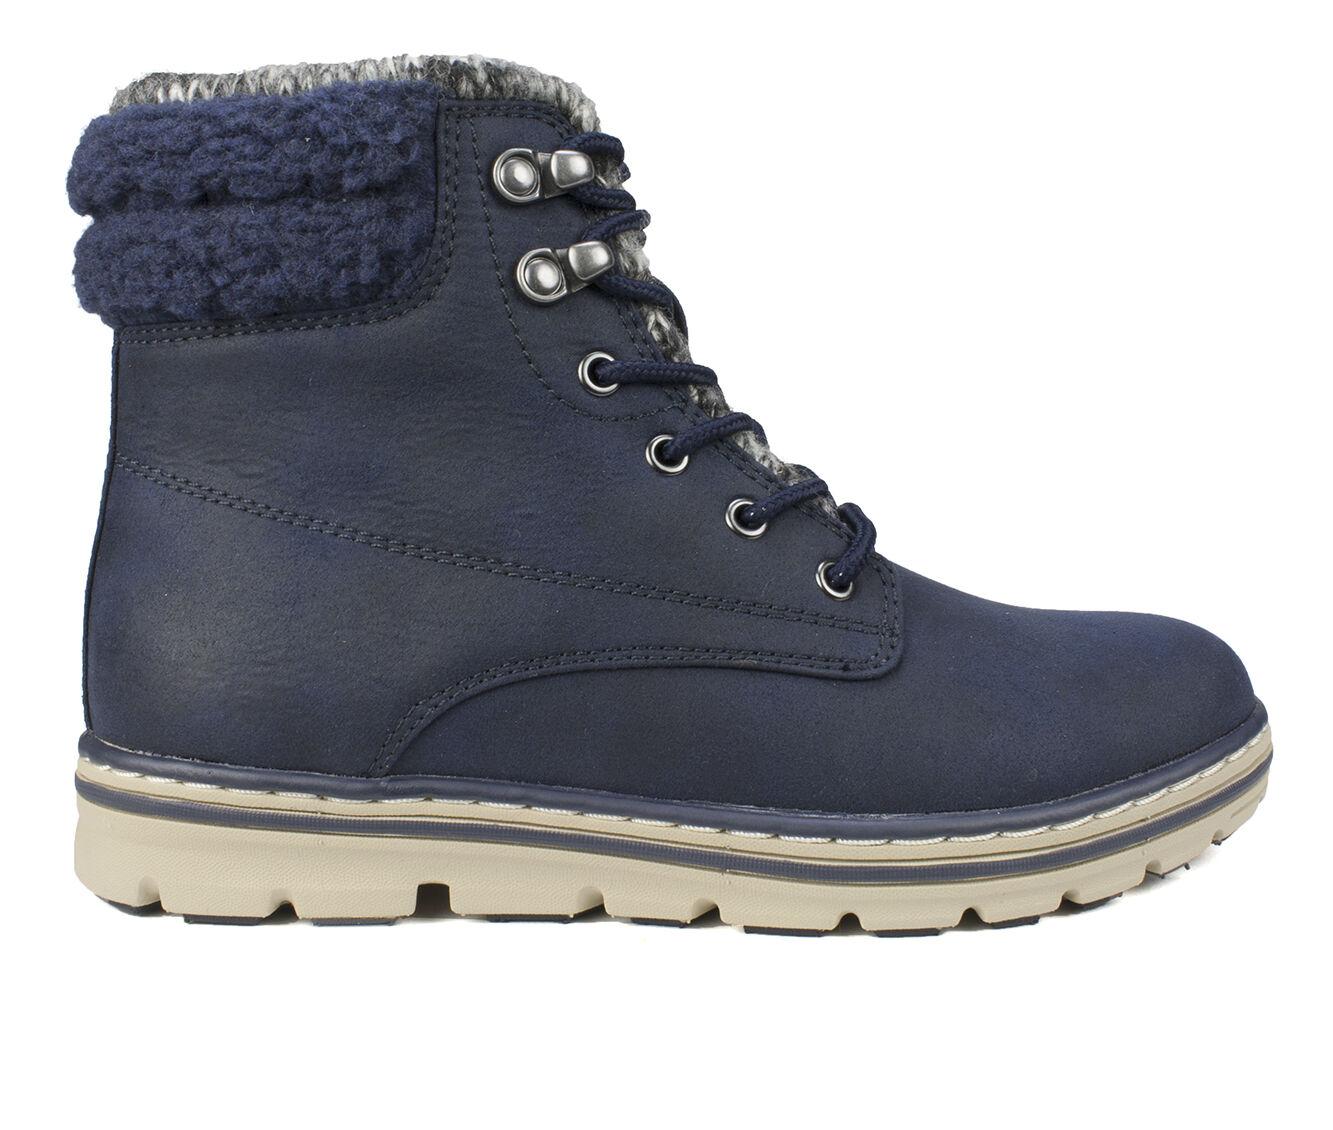 great discount Women's Cliffs Karis Hiking Boots Navy